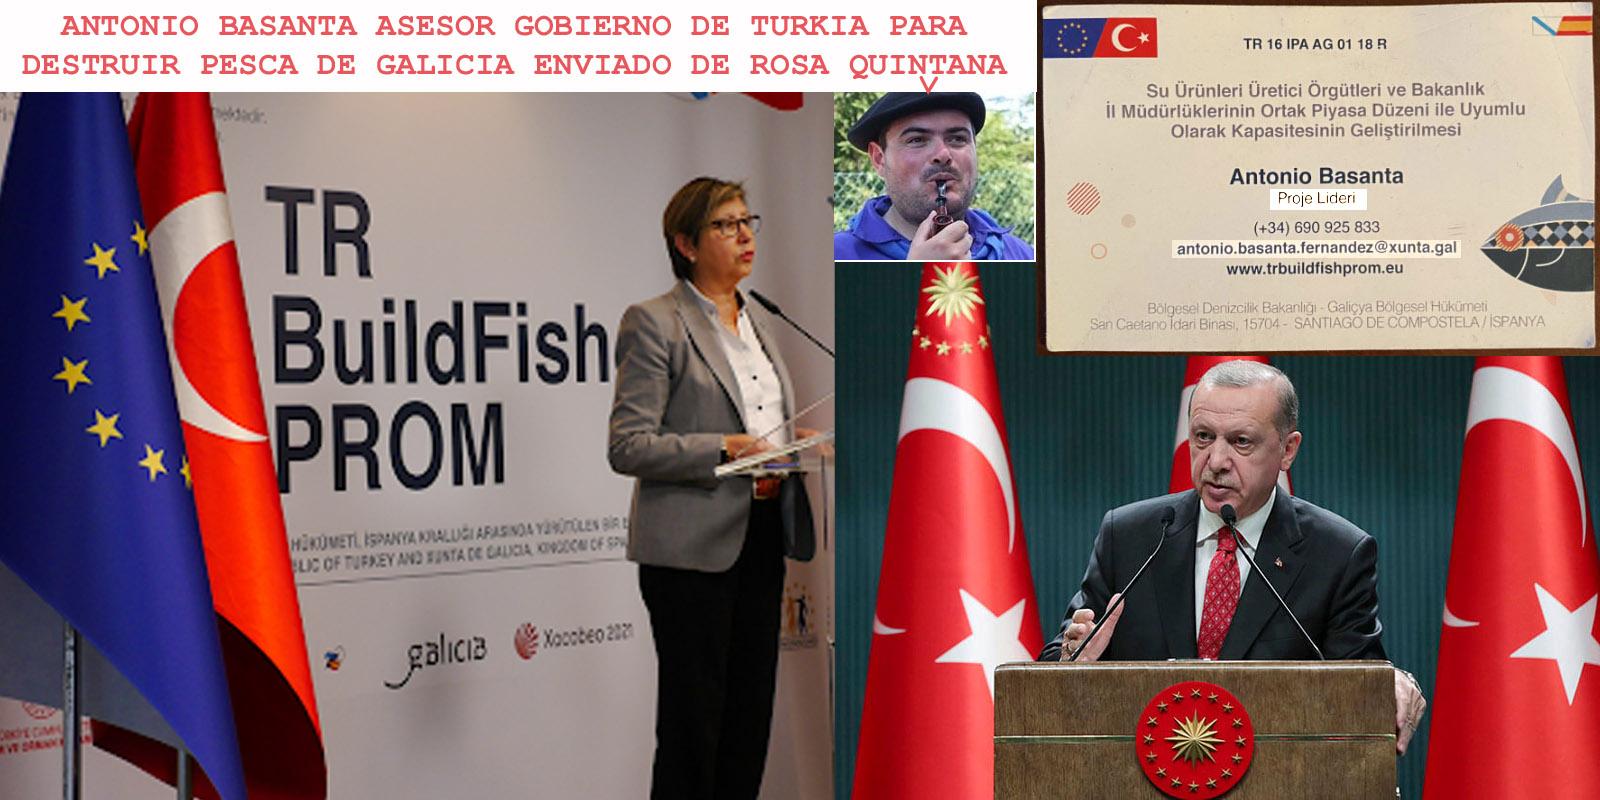 ANTONIOBASANTA ENVIADO ILEGAL DEROSAQUINTANA Y PPDEG A TURKIA ASESOR GOBIERNO ERDOGAN